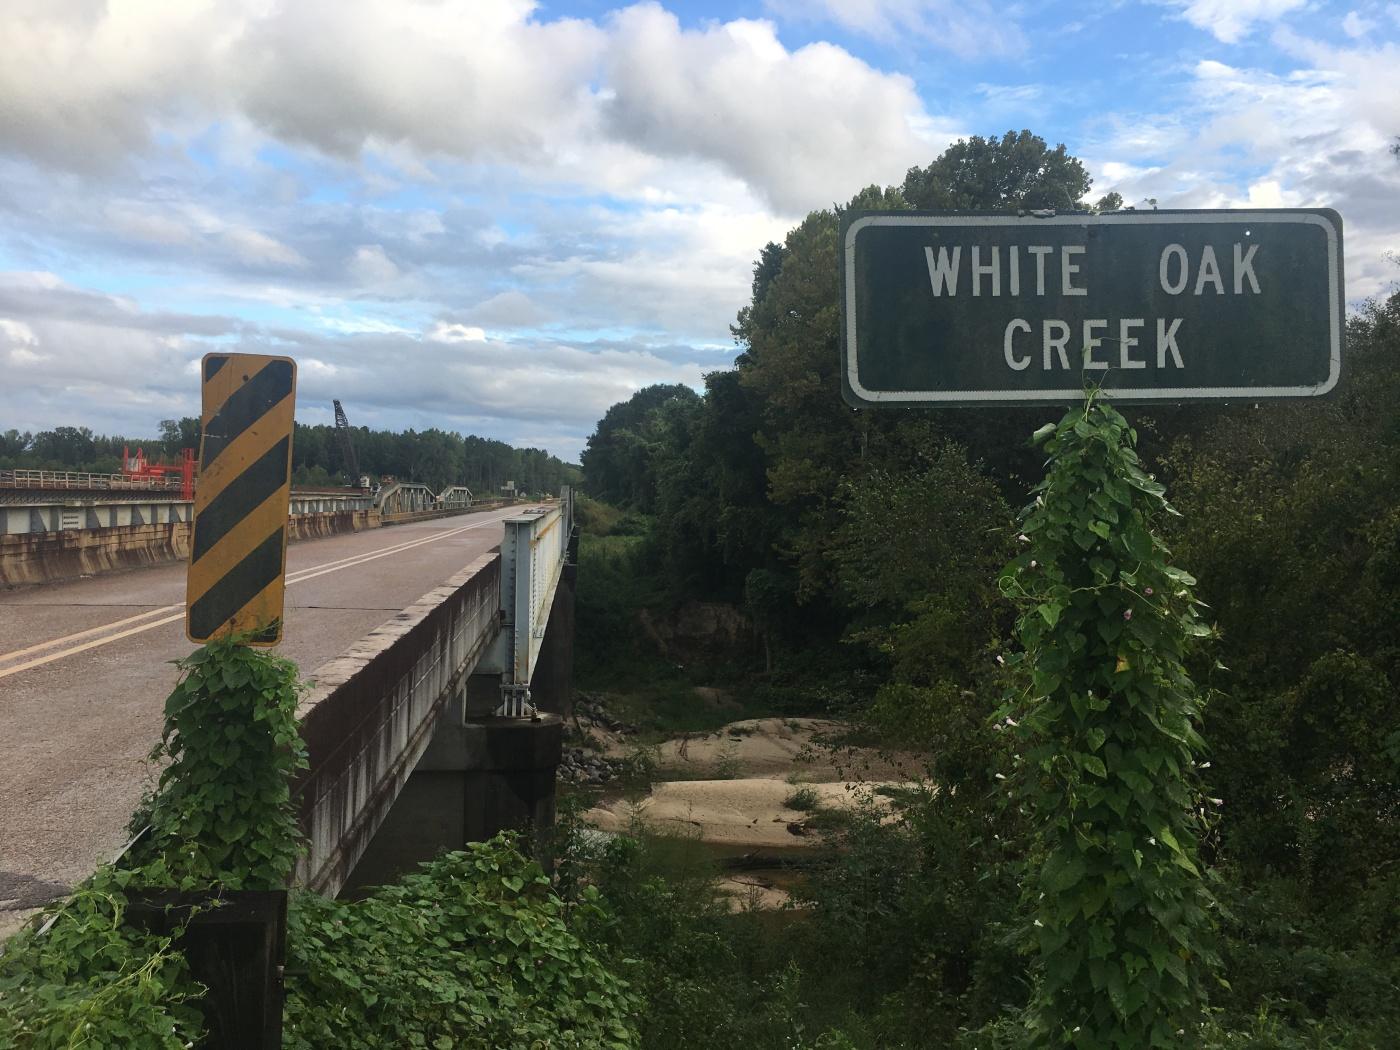 image of the White Oak Creek bridge on Highway 18